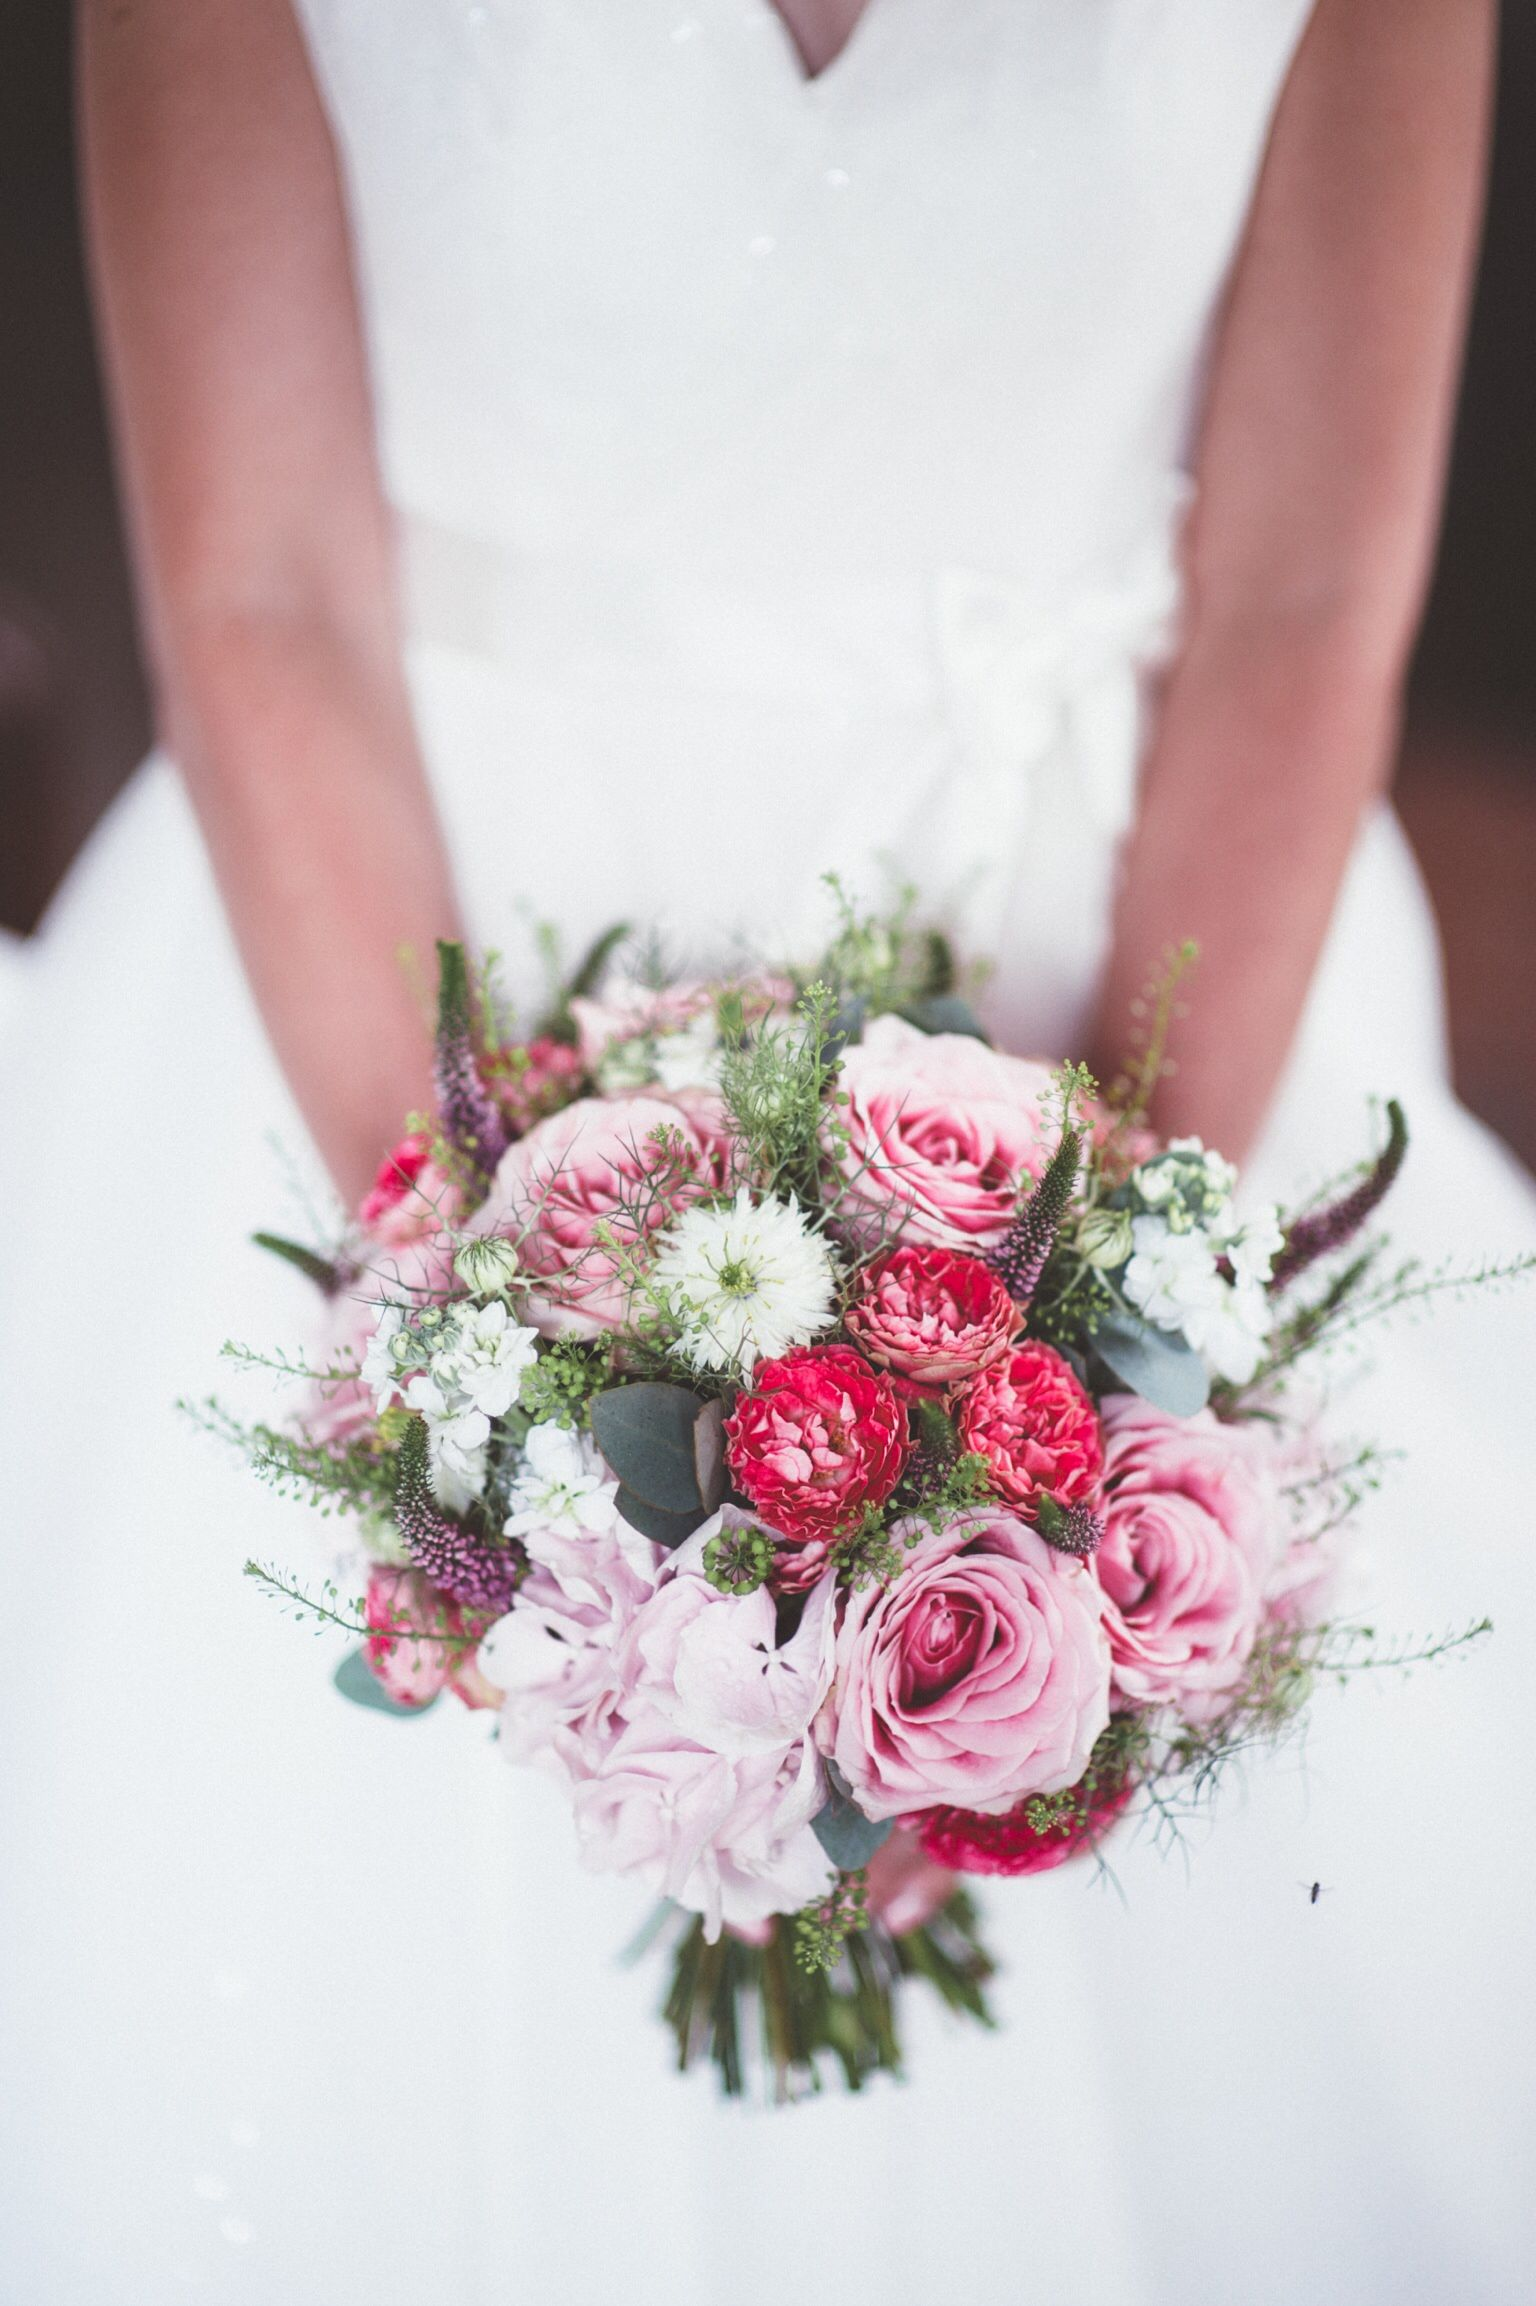 Blackmore Farm Wedding Flowers - Victoria and Paul | The Rose Shed | Wedding Flowers Bristol | Wedding Florist Bristol, Bath, Somerset